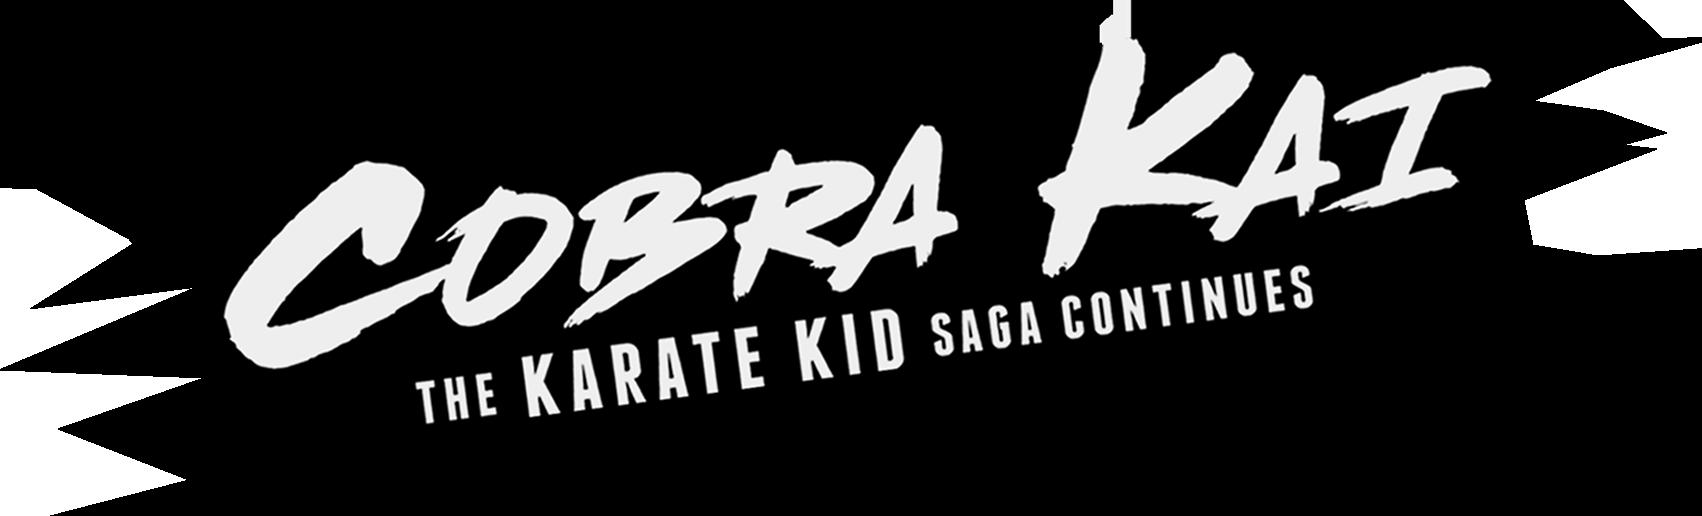 Review - Cobra Kai: The Karate Kid Saga Continues - Geeks ...